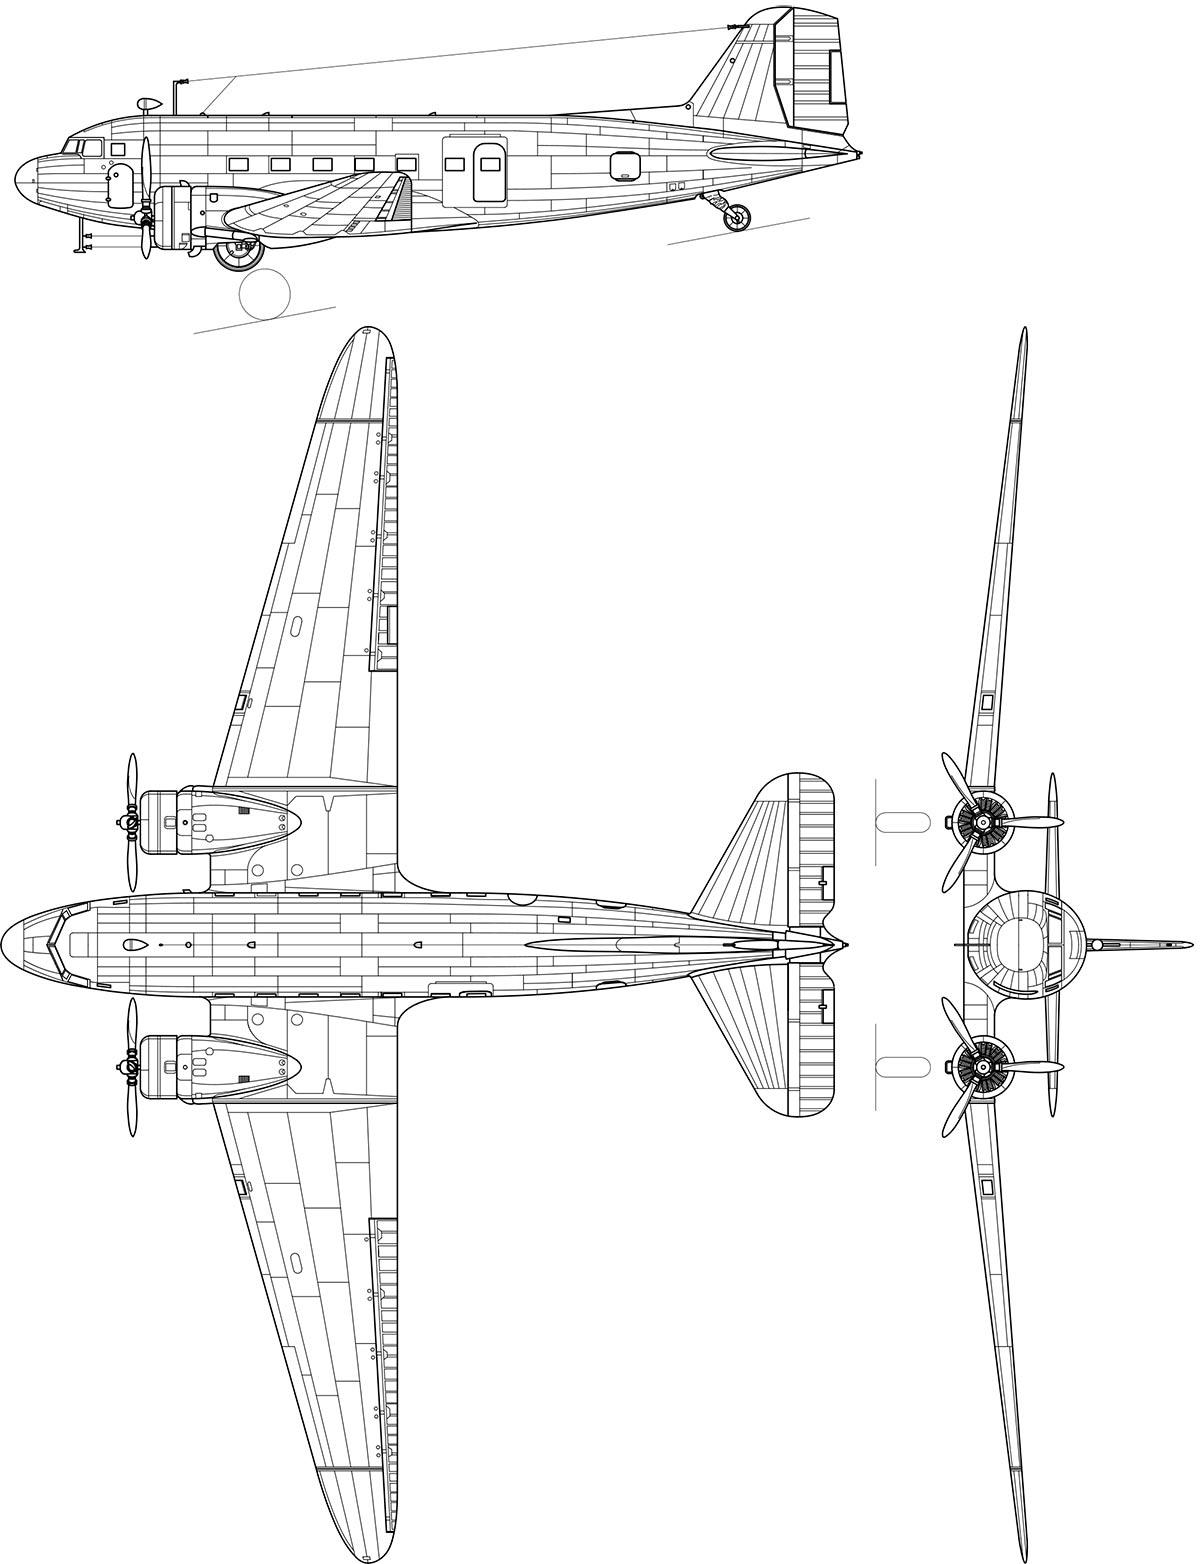 Чертеж военно-транспортного самолета Ли-2